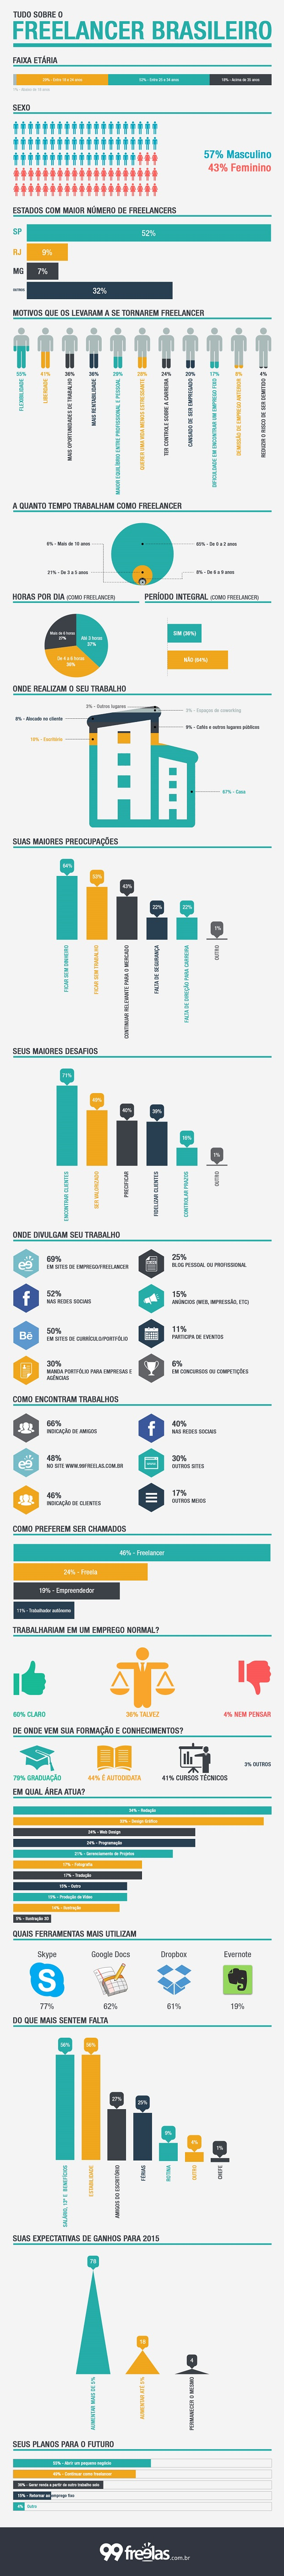 infografico-tudo-sobre-o-freelancer-brasileiro1